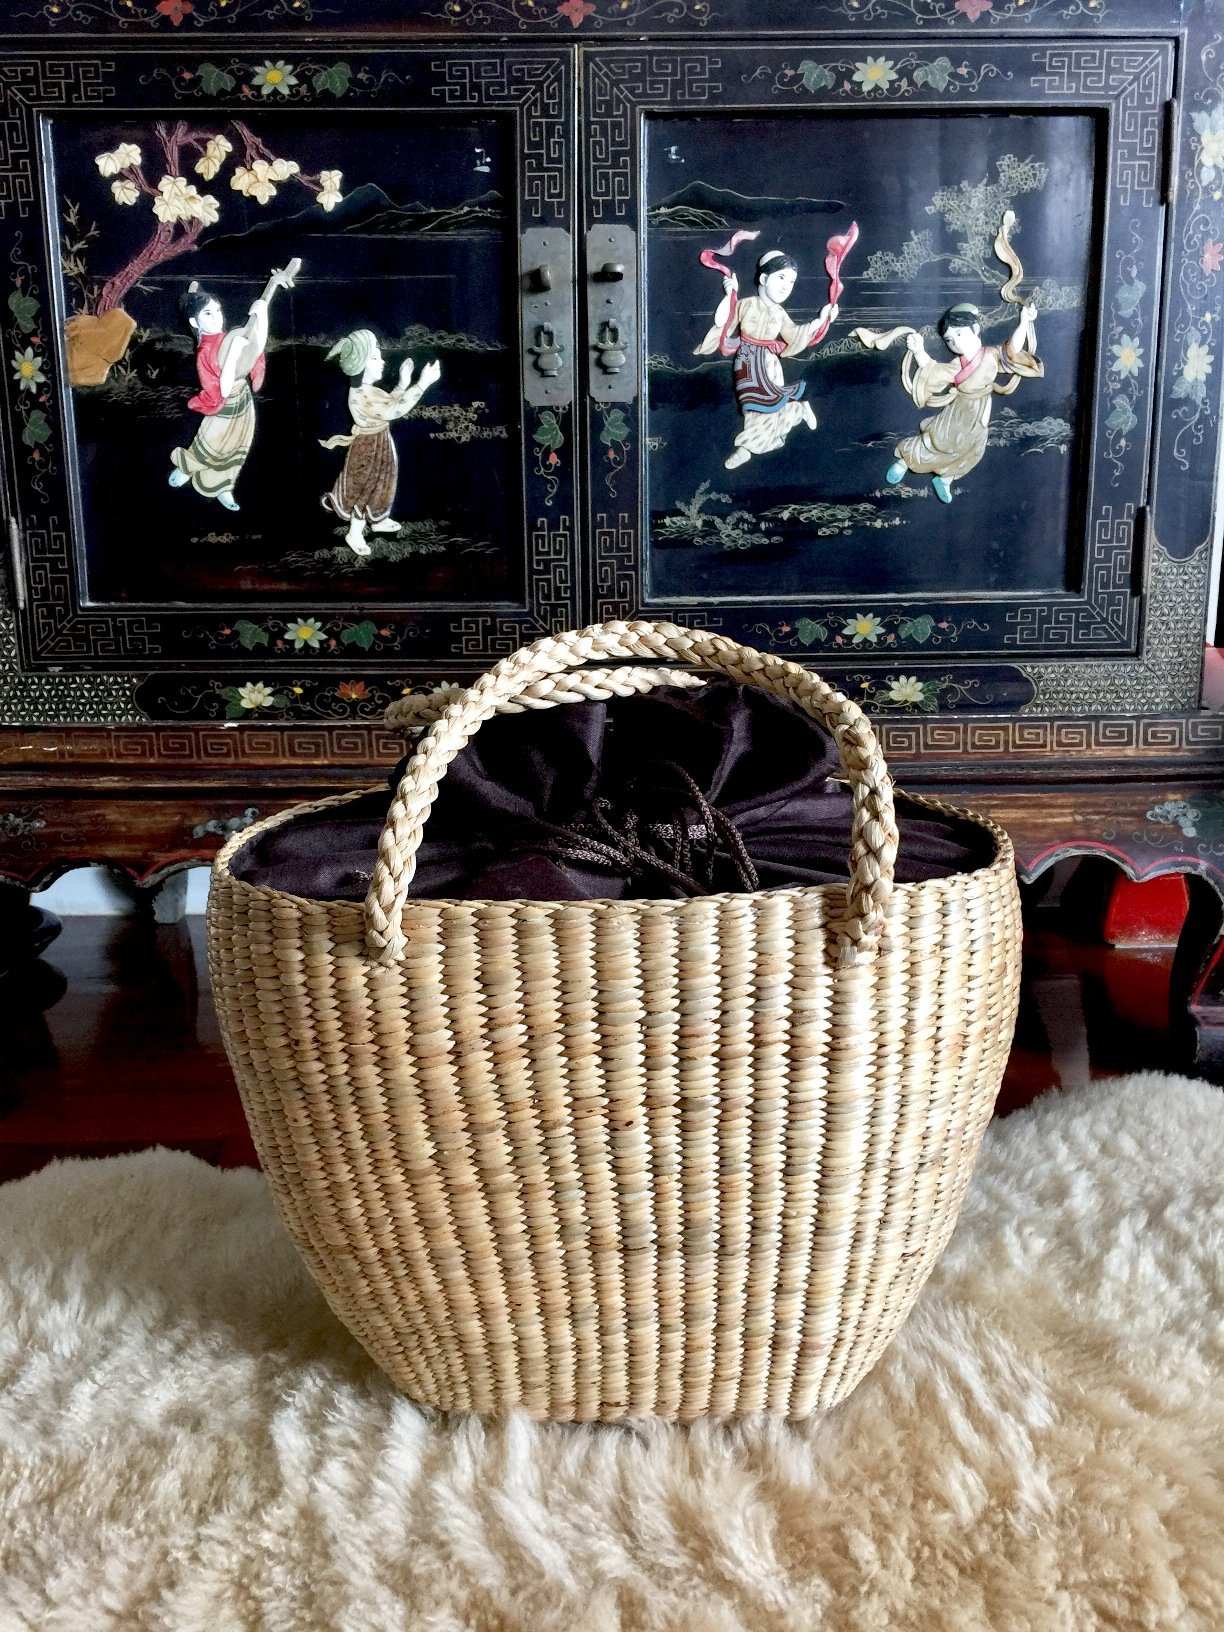 Large Straw Beach Basket,Straw Basket Tote,Large Straw Bag,Woven Straw Bag,Straw Tote